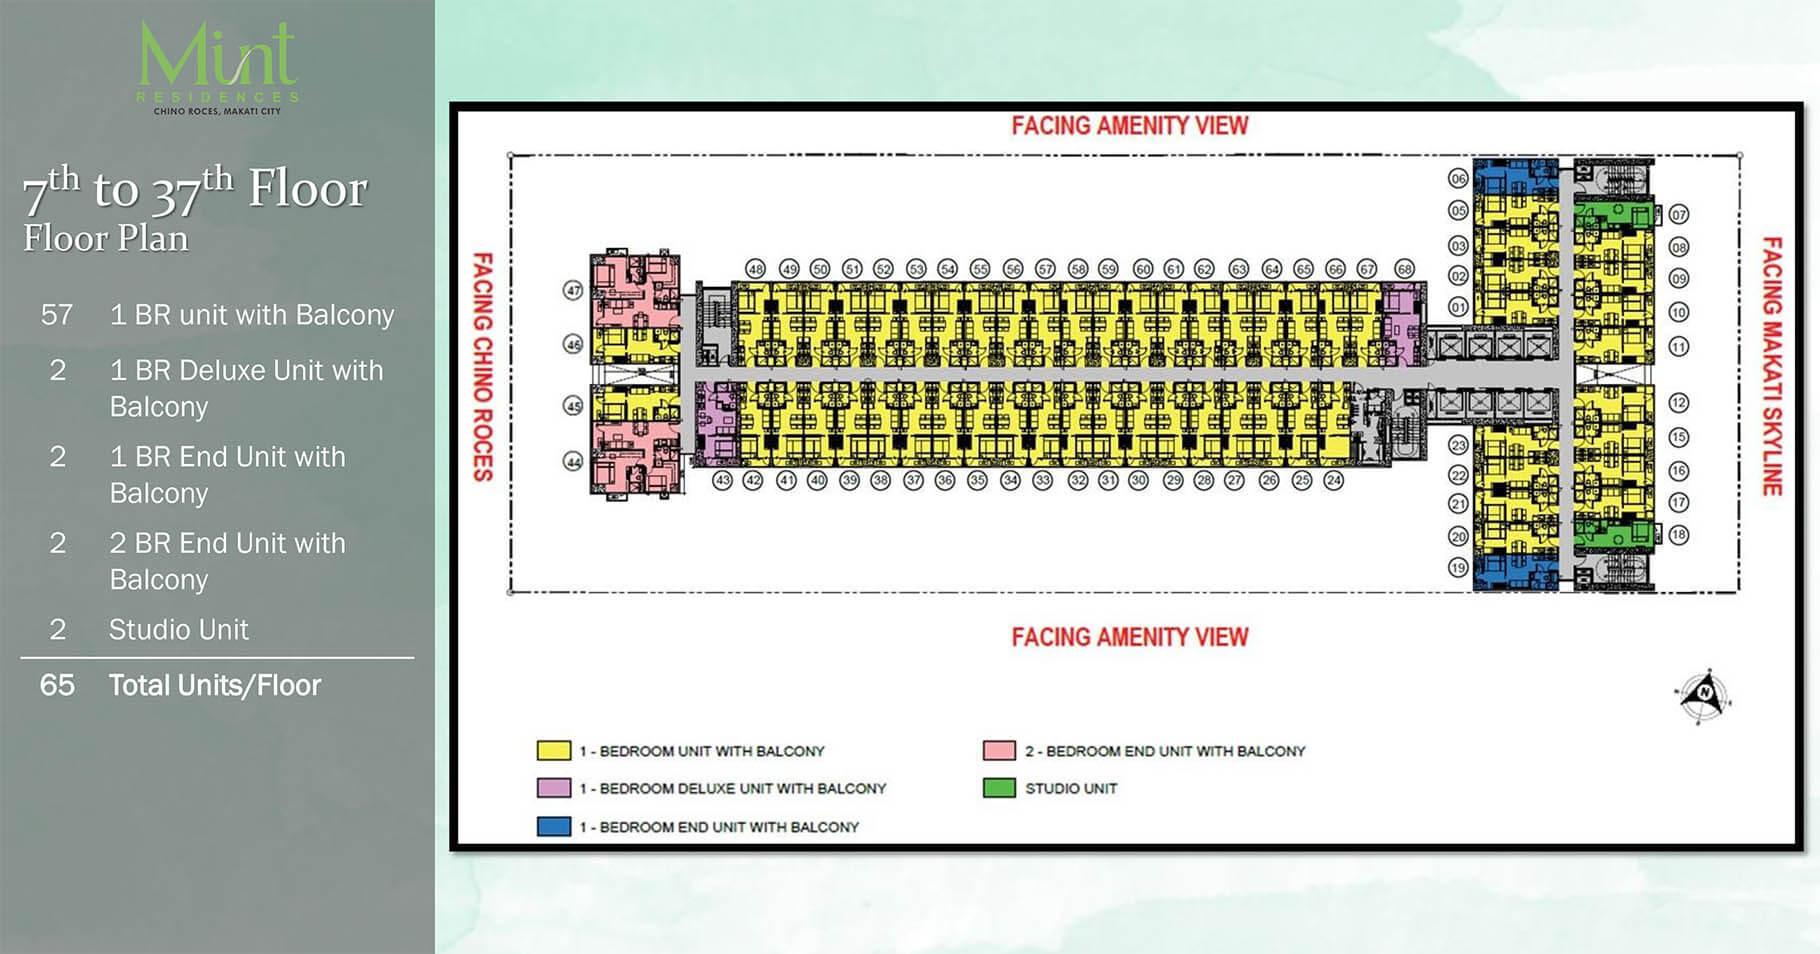 Mint Residences 7th-37th Floor plan